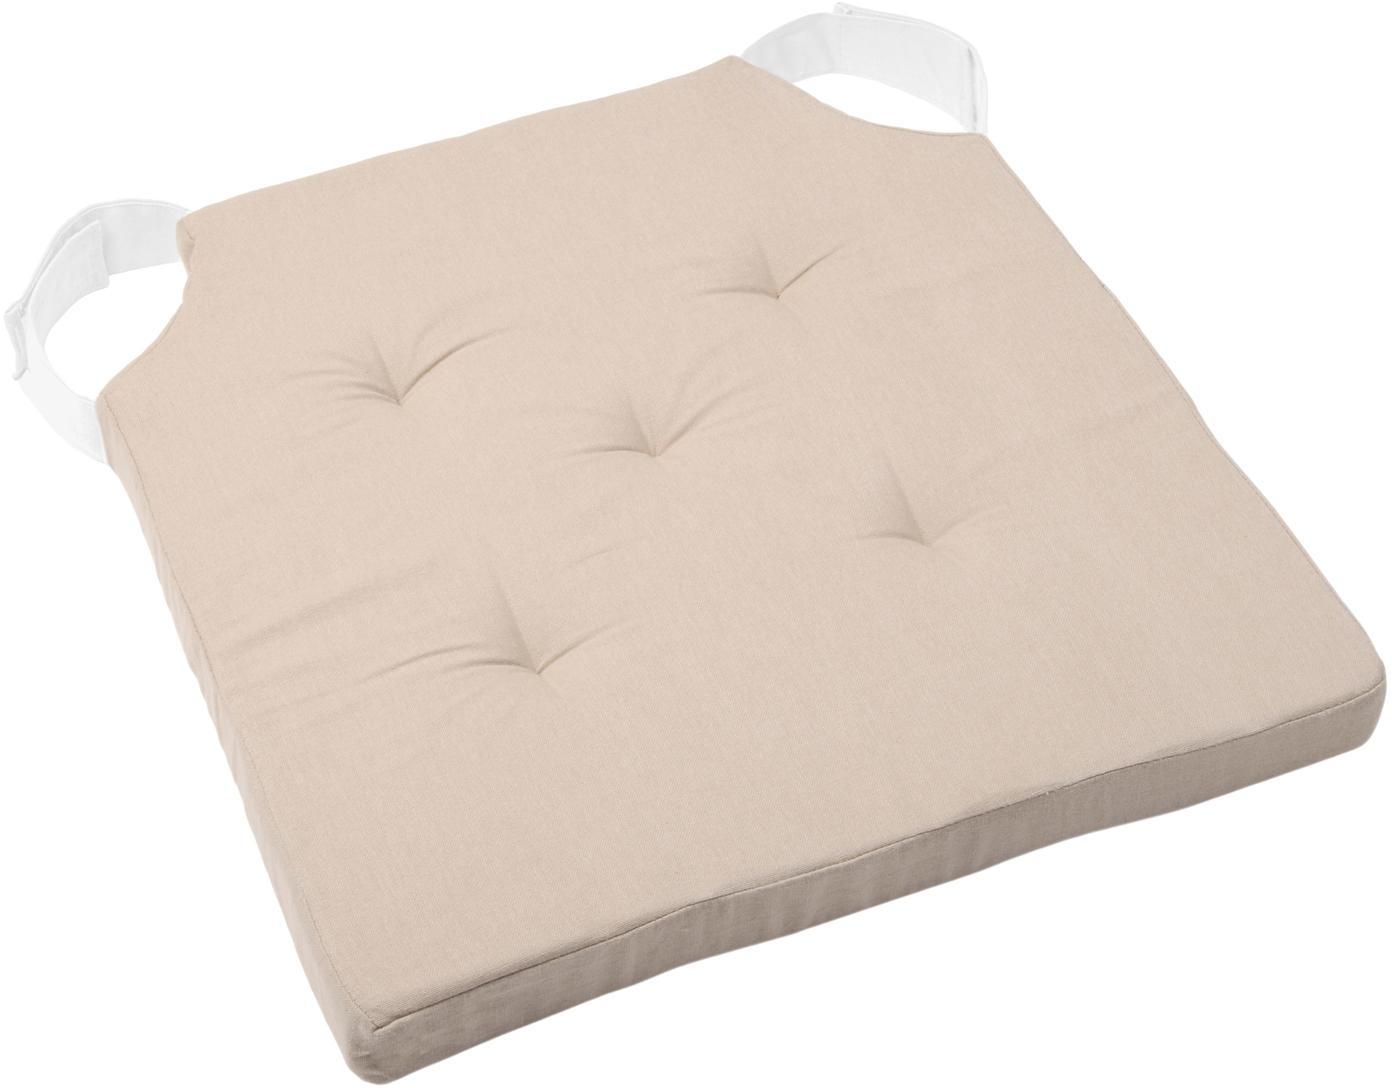 Cuscino sedia Duo, Rivestimento: cotone, Beige, Larg. 40 x Lung. 40 cm